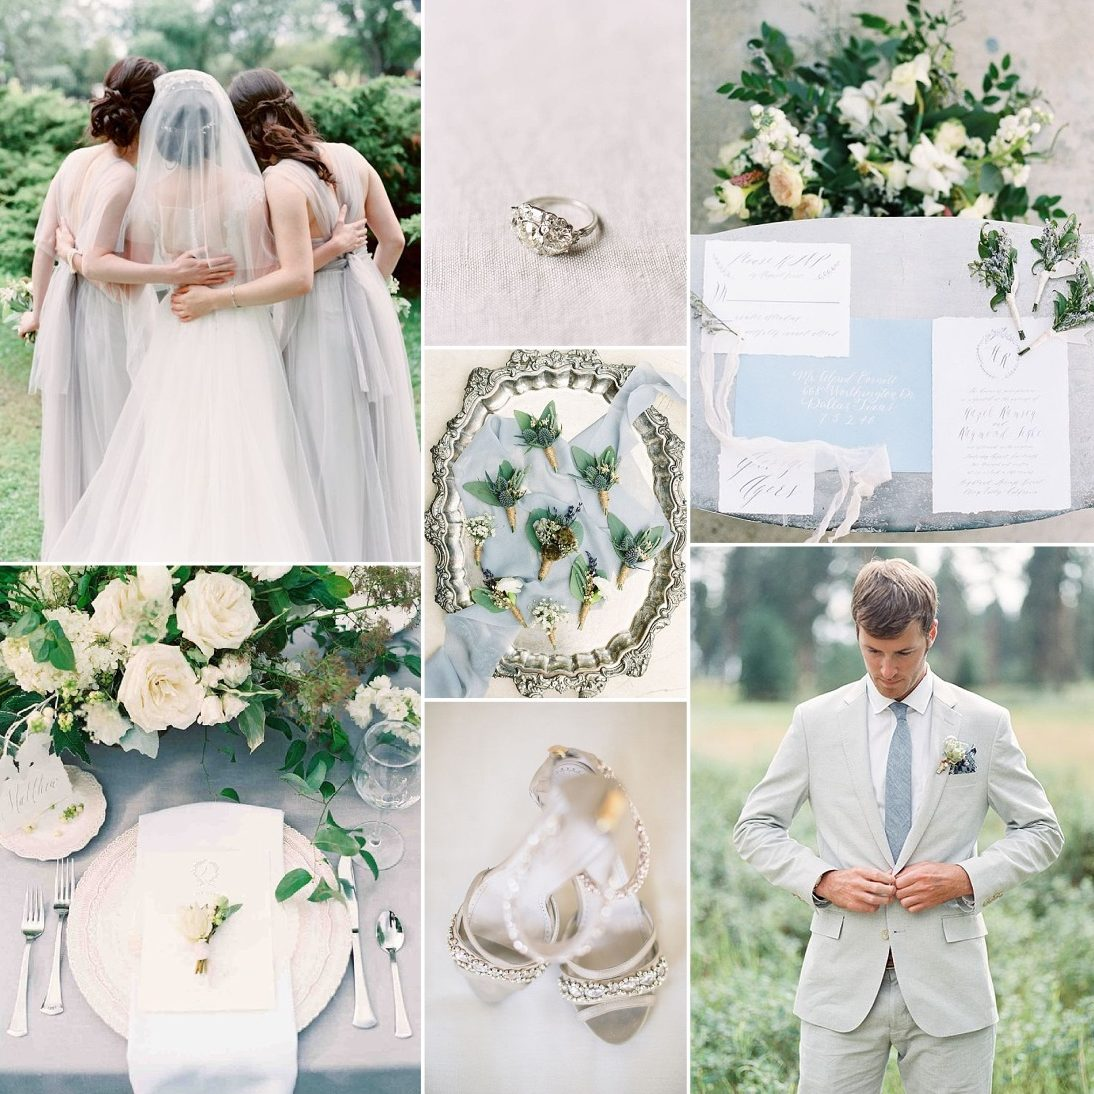 https://chicvintagebrides.com/wp-content/uploads/2018/10/Spring-Mist-Wedding-Inspiration-Board-1-e1538624752340.jpg